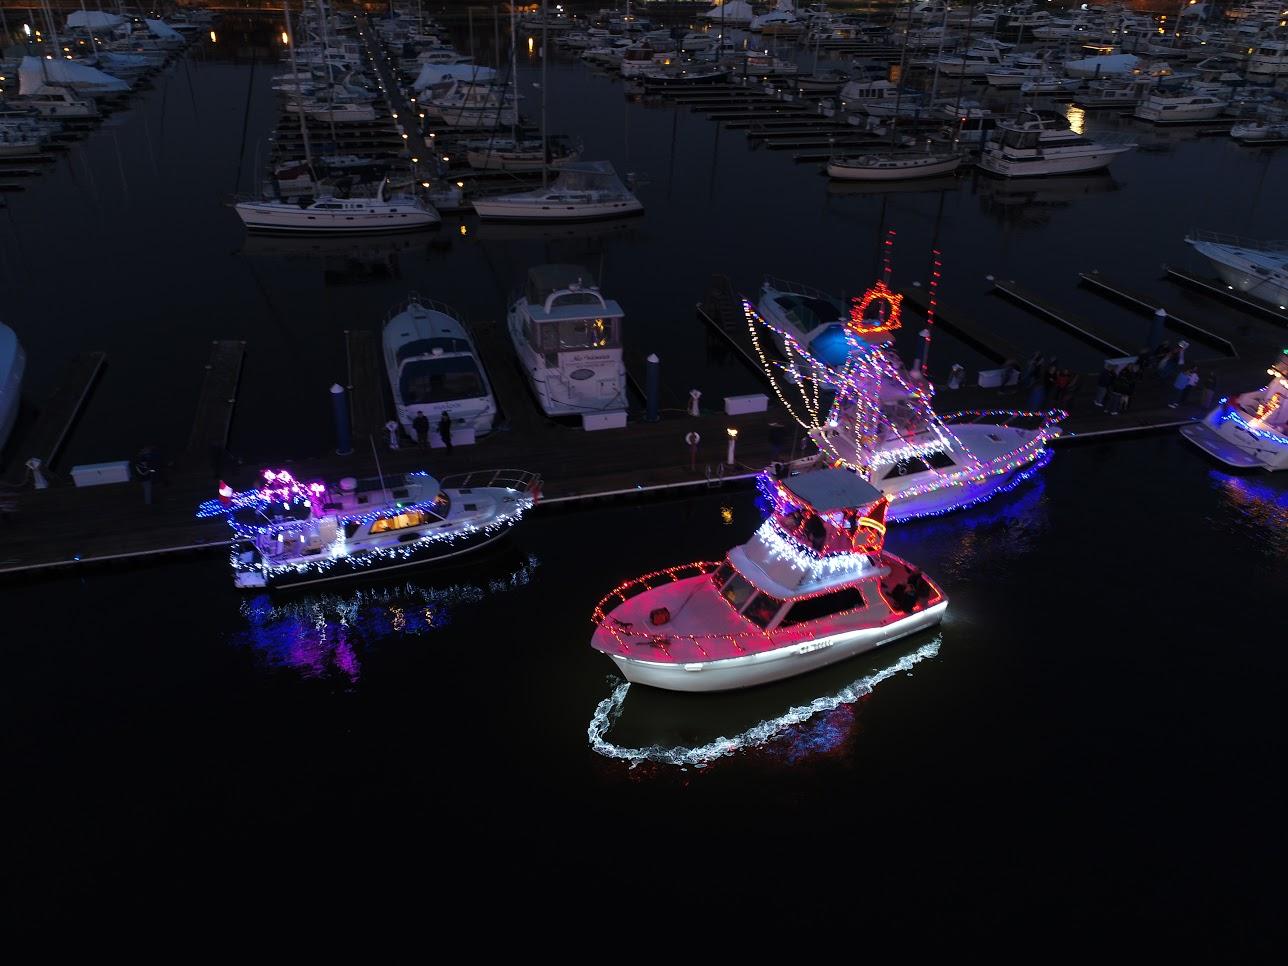 Baltimore's Parade of Lighted Boats — Anchorage Marina